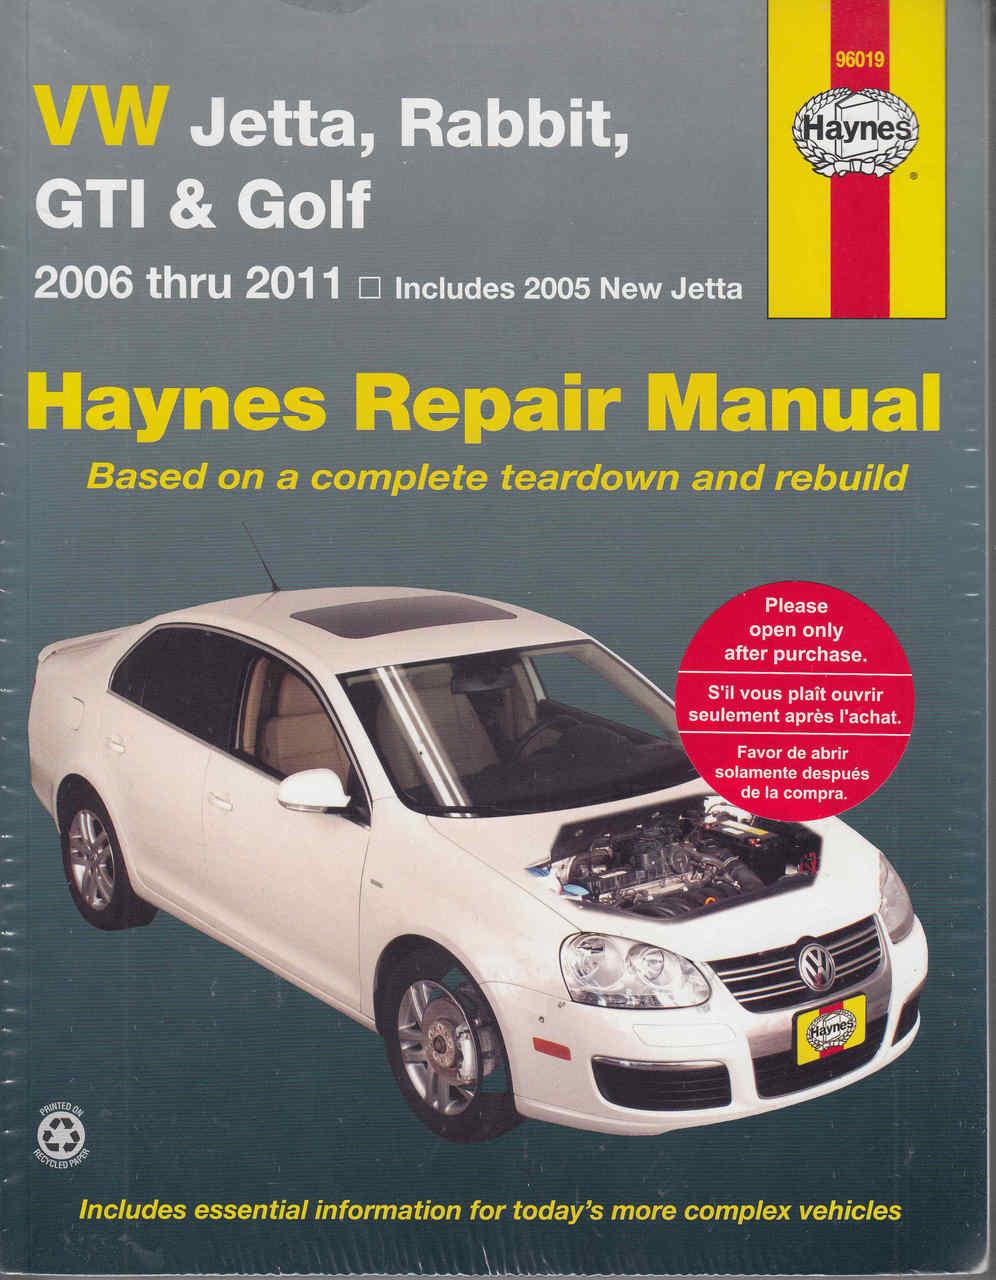 vw jetta rabbit gti golf 2006 2011 repair manual rh automotobookshop com au golf 5 gti repair manual peugeot 208 gti repair manual